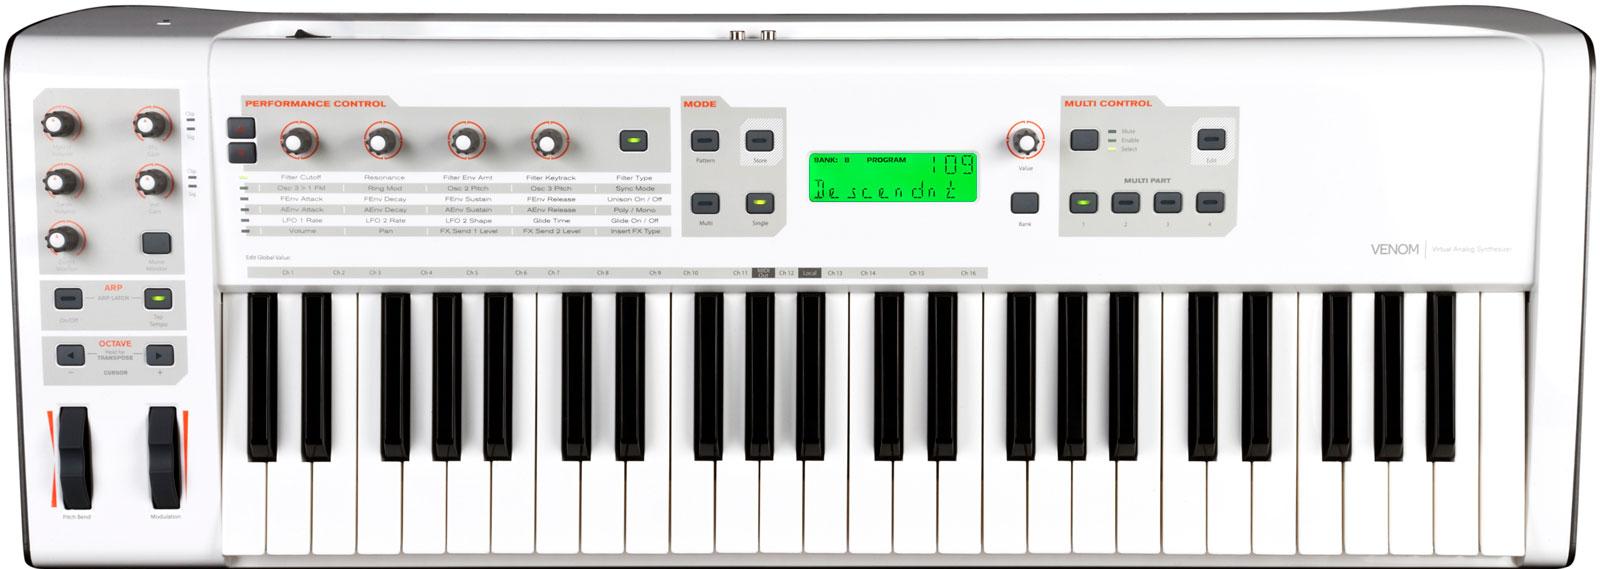 m-audio-venom-670448.jpg